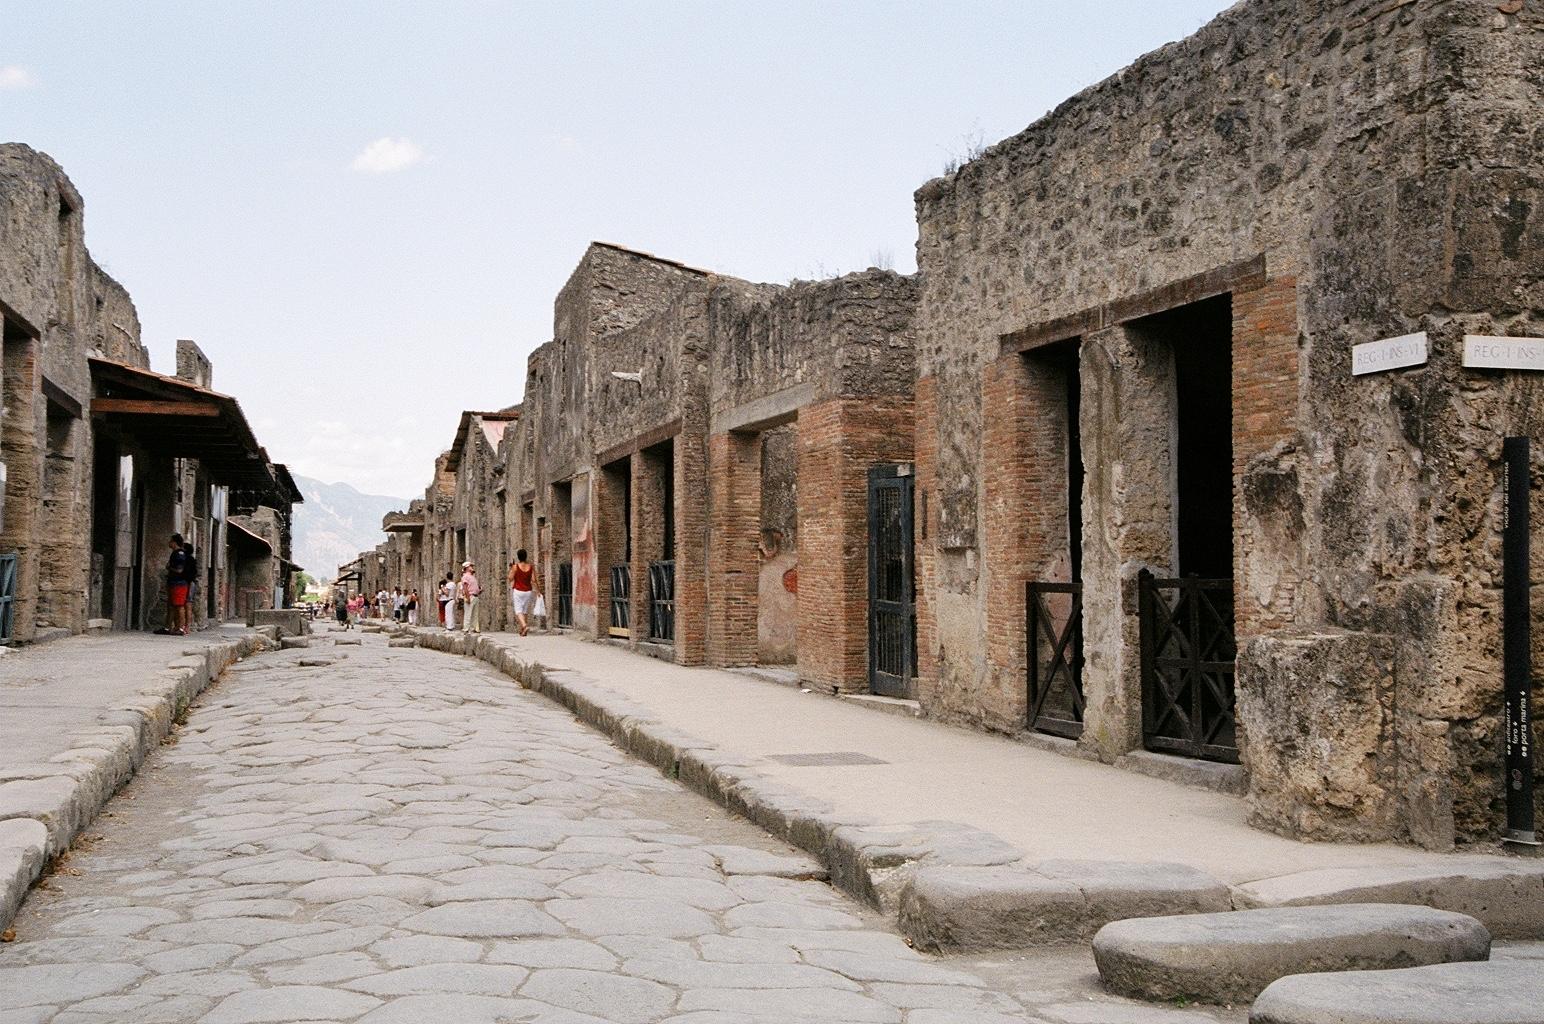 Pompeii shopping street (Source: Flickr via Creative Commons License)